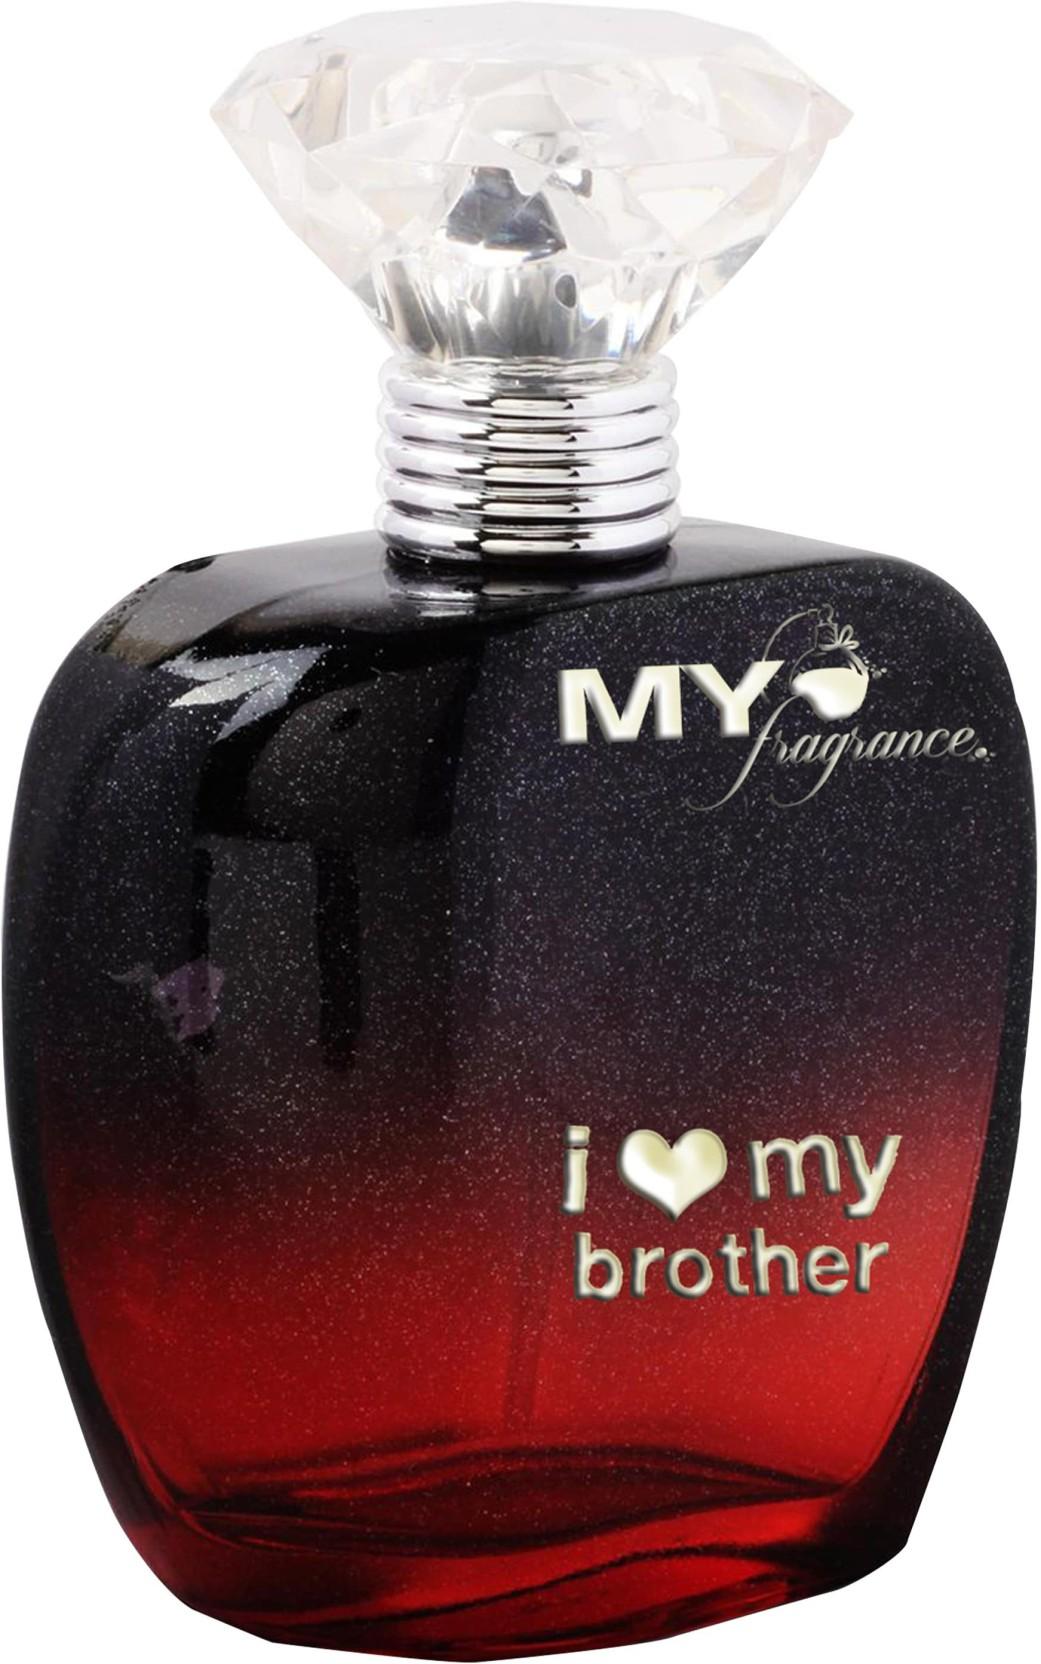 https://rukminim1.flixcart.com/image/1664/1664/j5vcknk0/perfume/h/u/m/100-present-raksha-bandhan-gift-for-your-brother-100-ml-digital-original-imaew89yrnskkdvm.jpeg?q=90